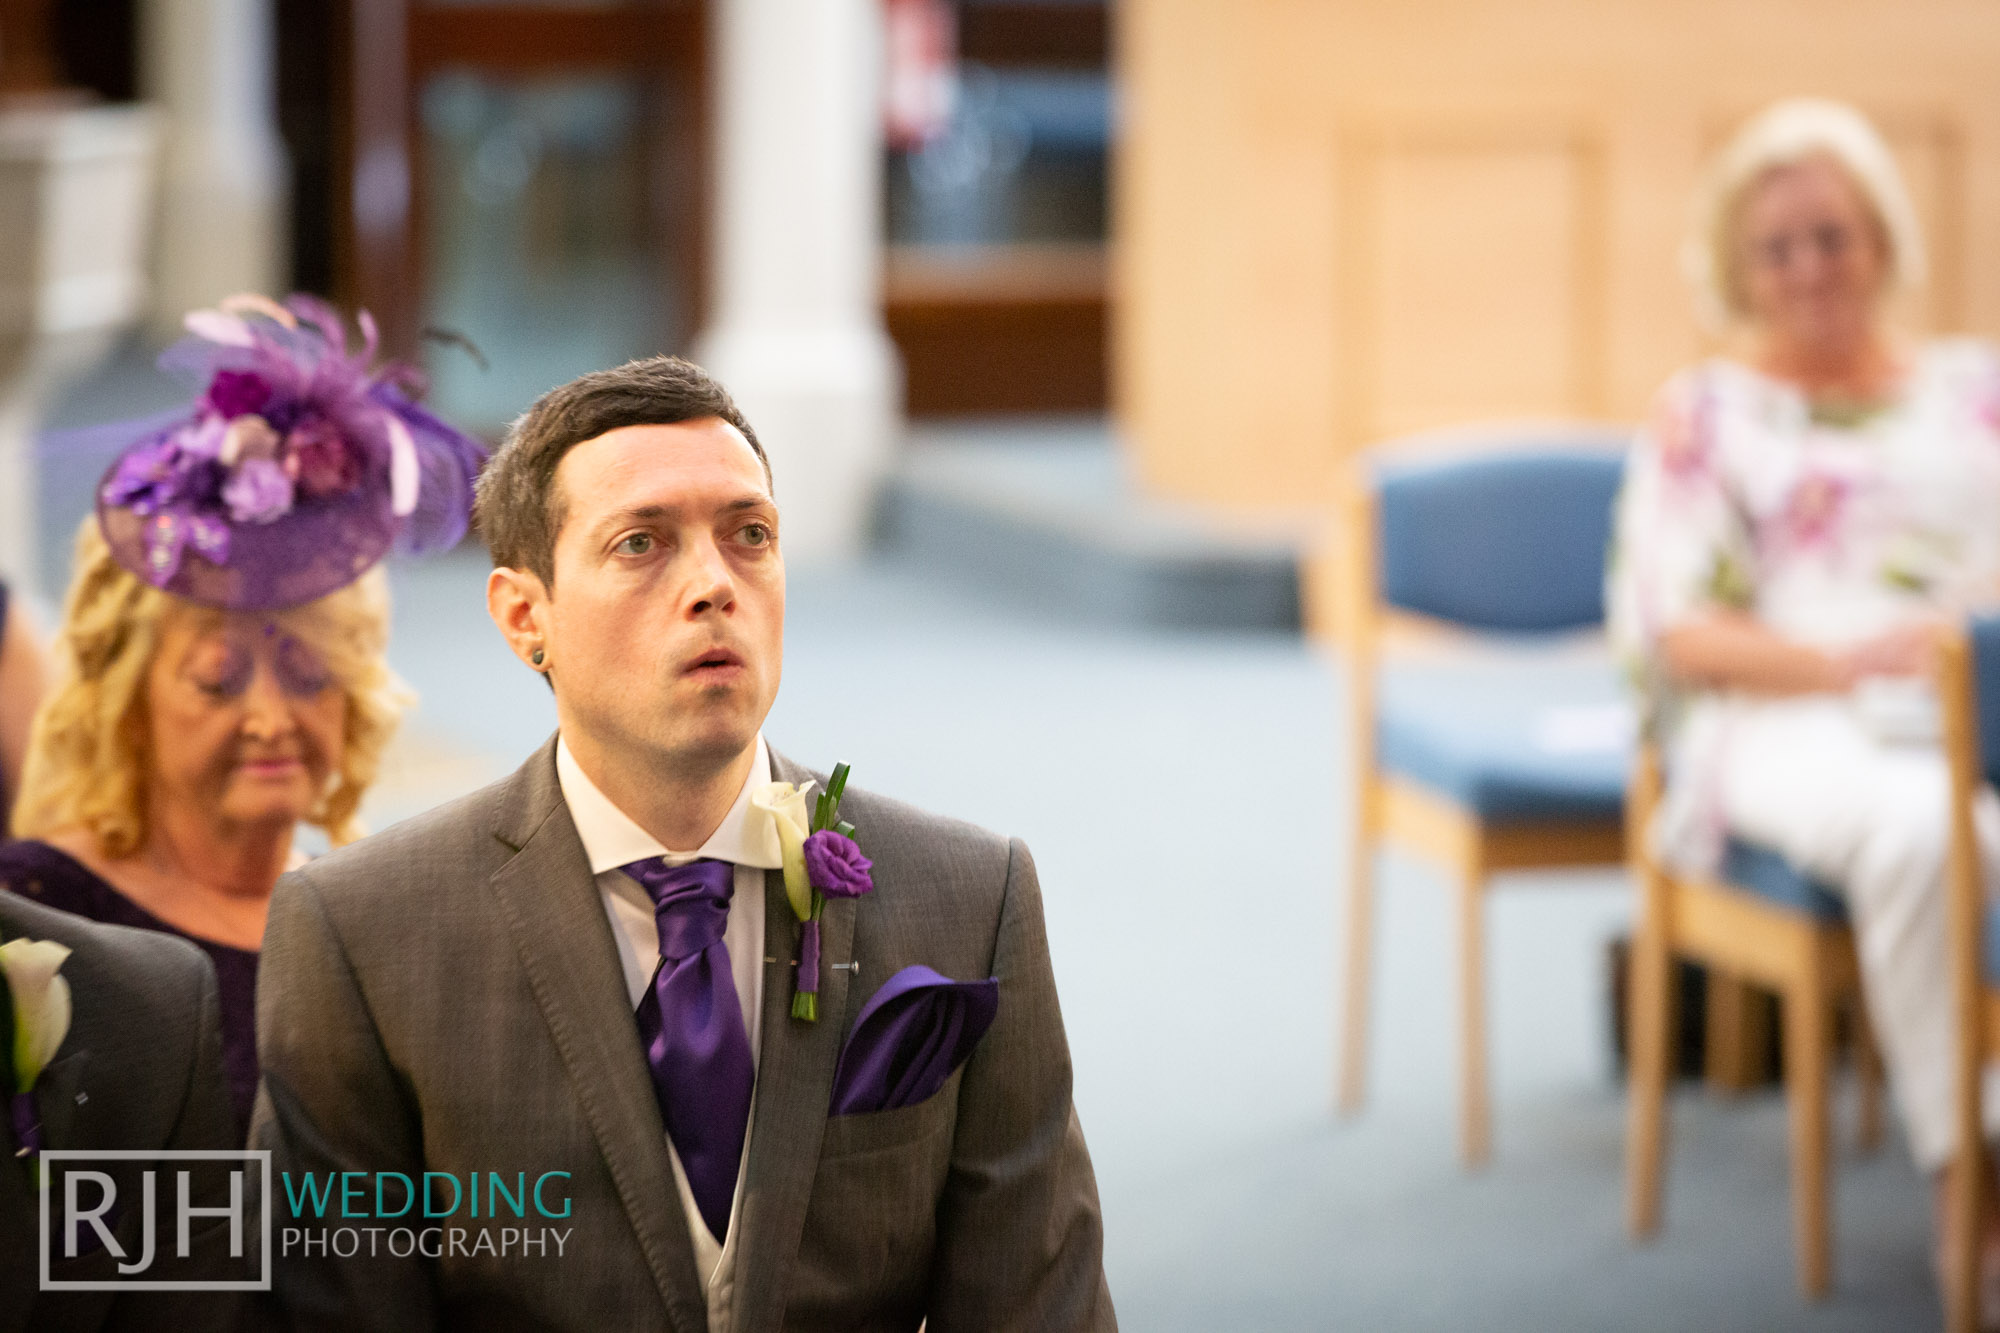 Oulton Hall Wedding Photography_Goodwill-Hall_019_RJH17255.jpg